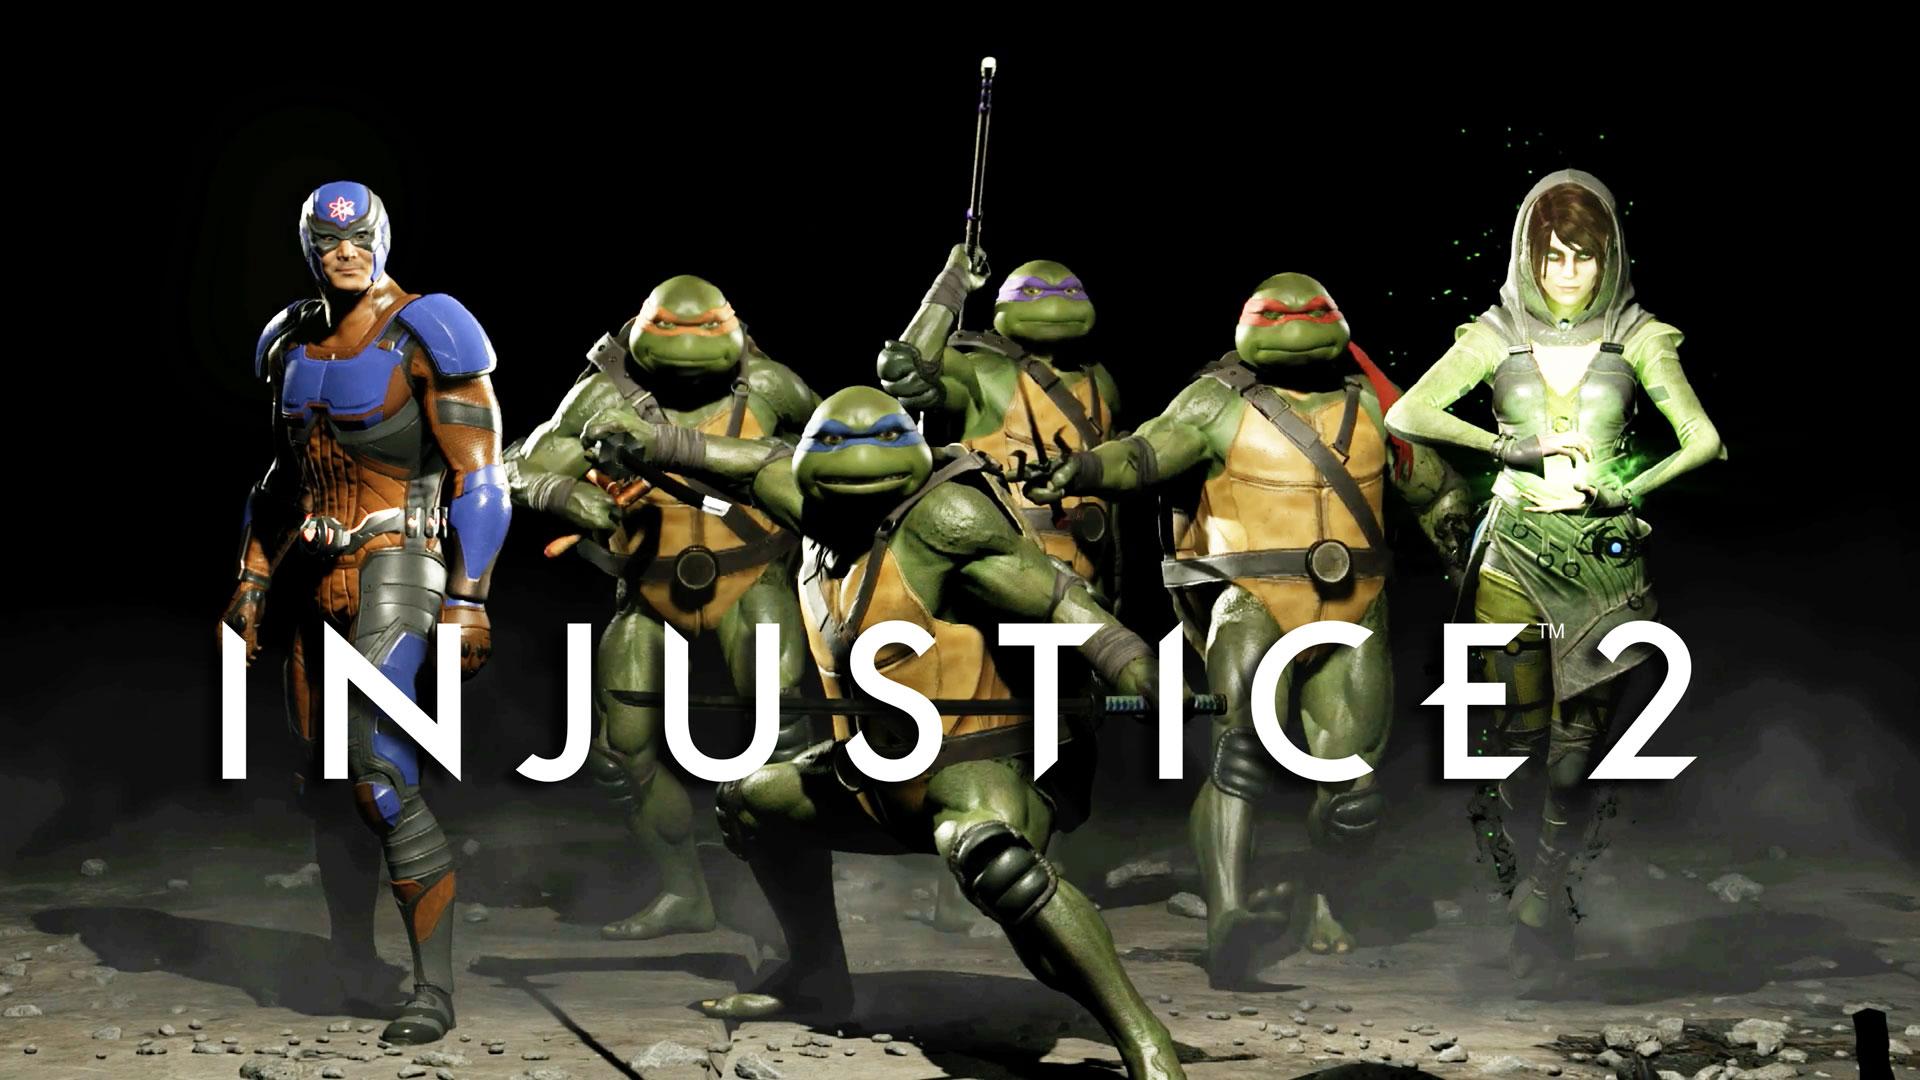 IJ2_Turtles_thumb_5a0cacd718dee5.47995938